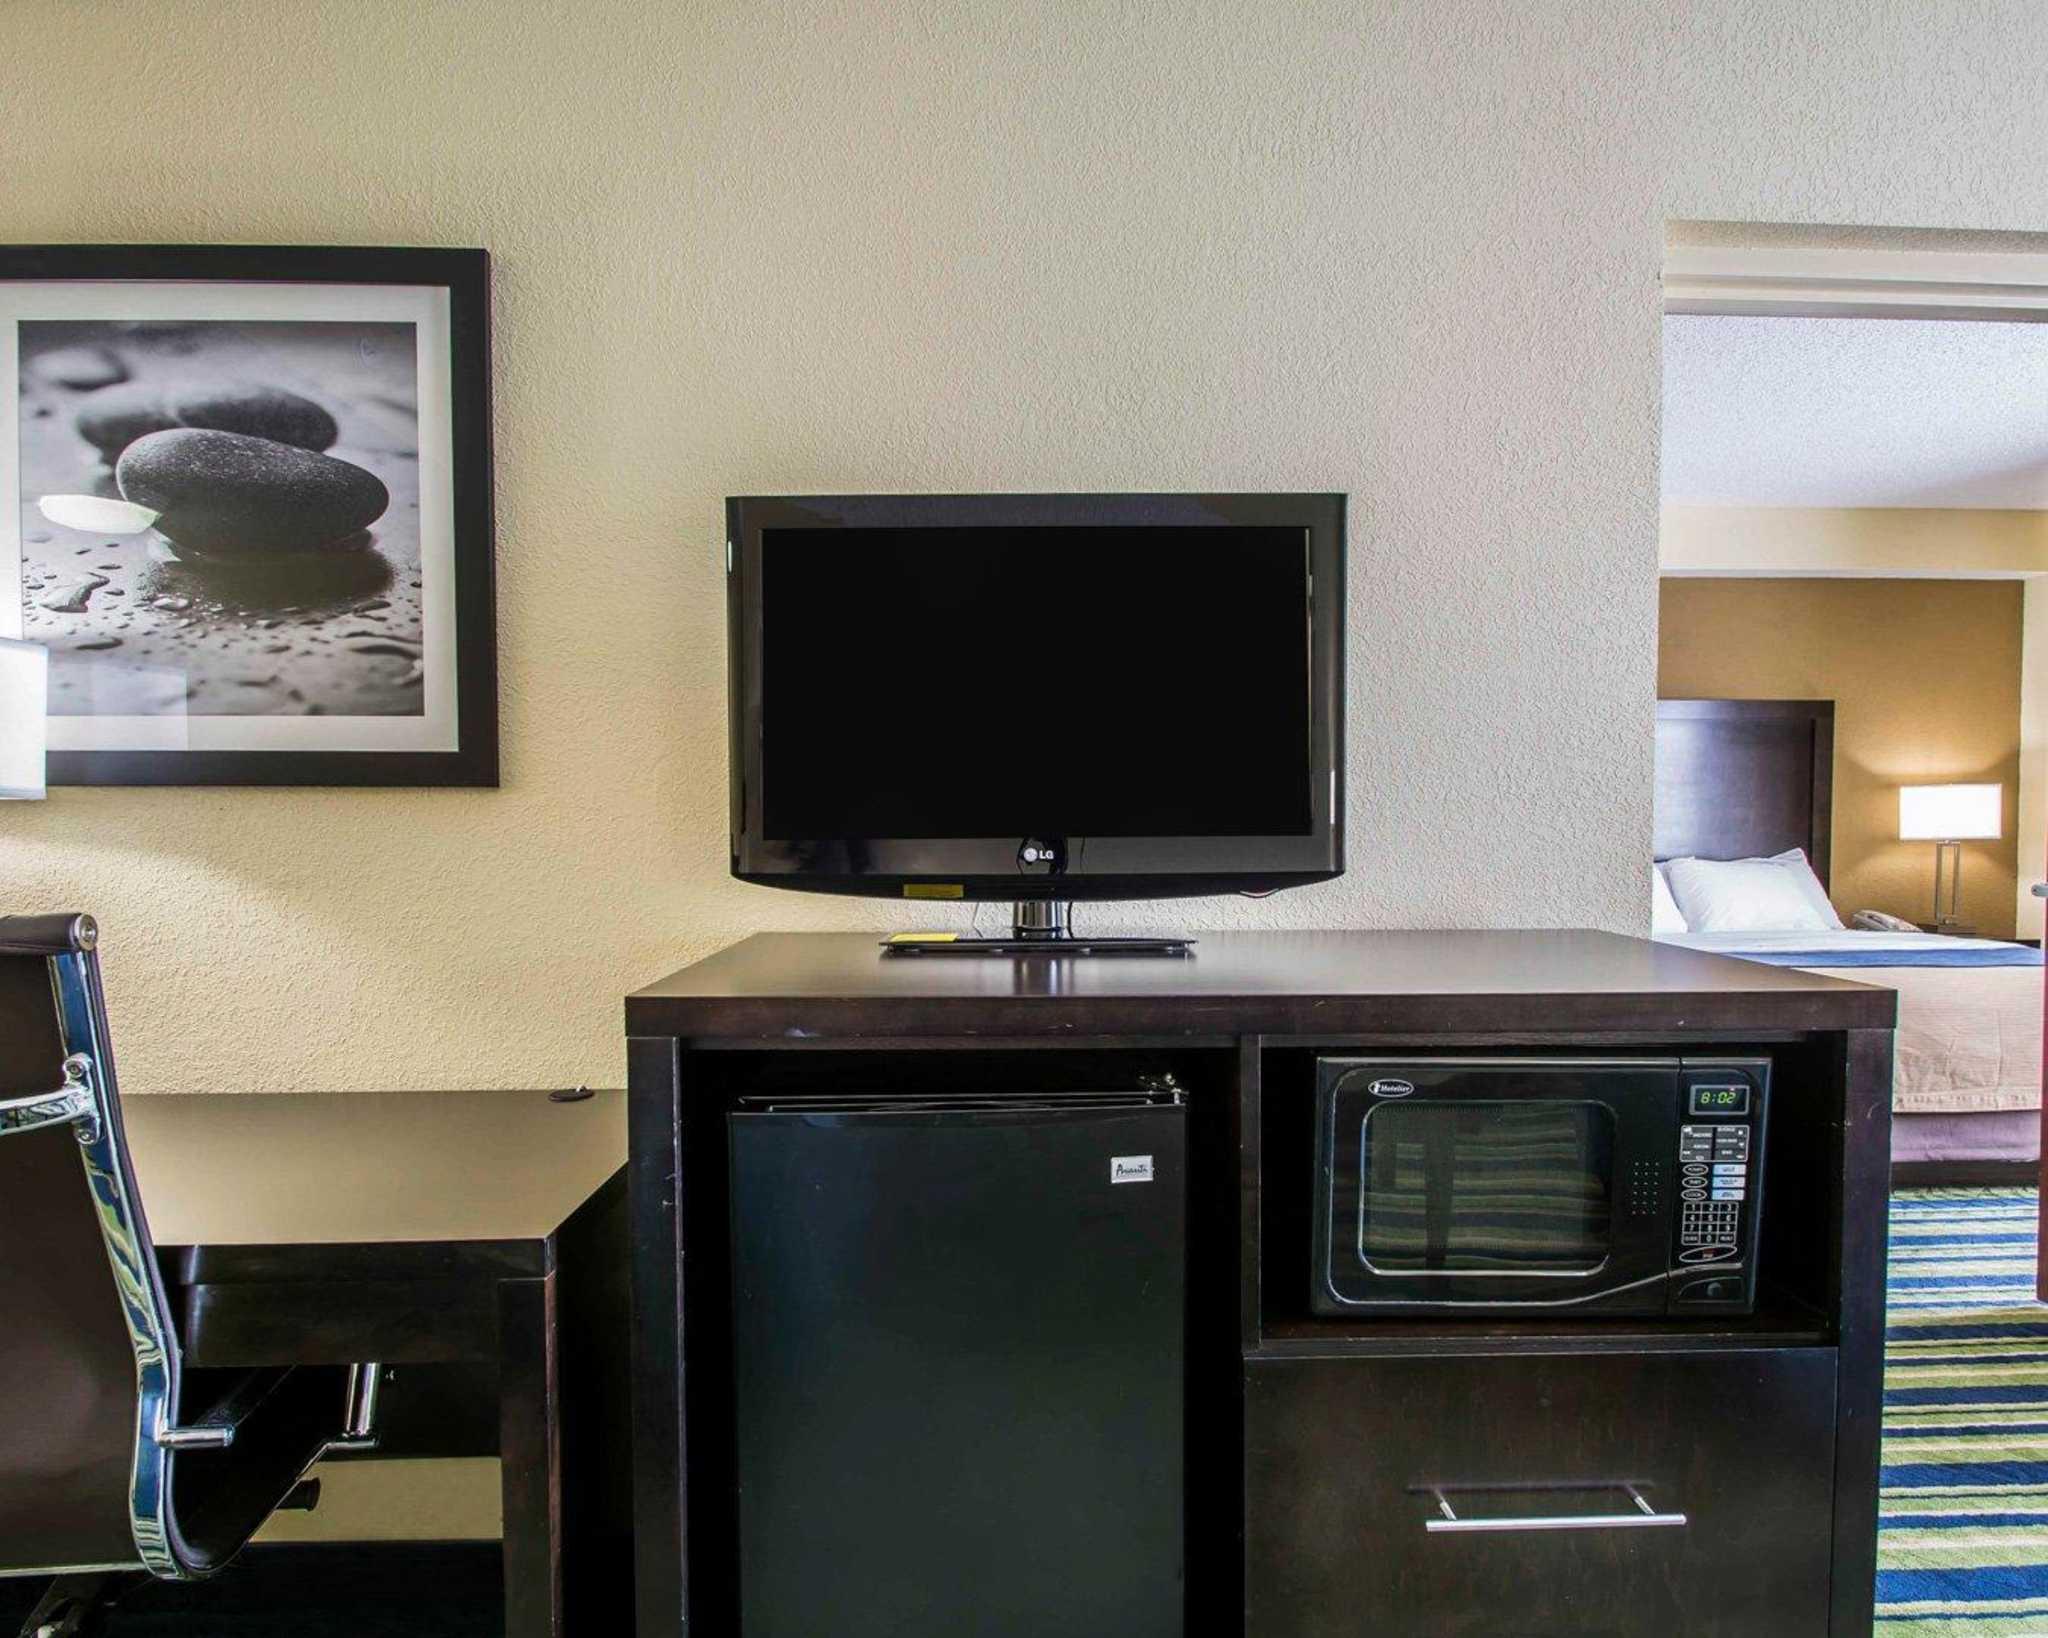 Comfort Inn & Suites Lantana - West Palm Beach South image 22